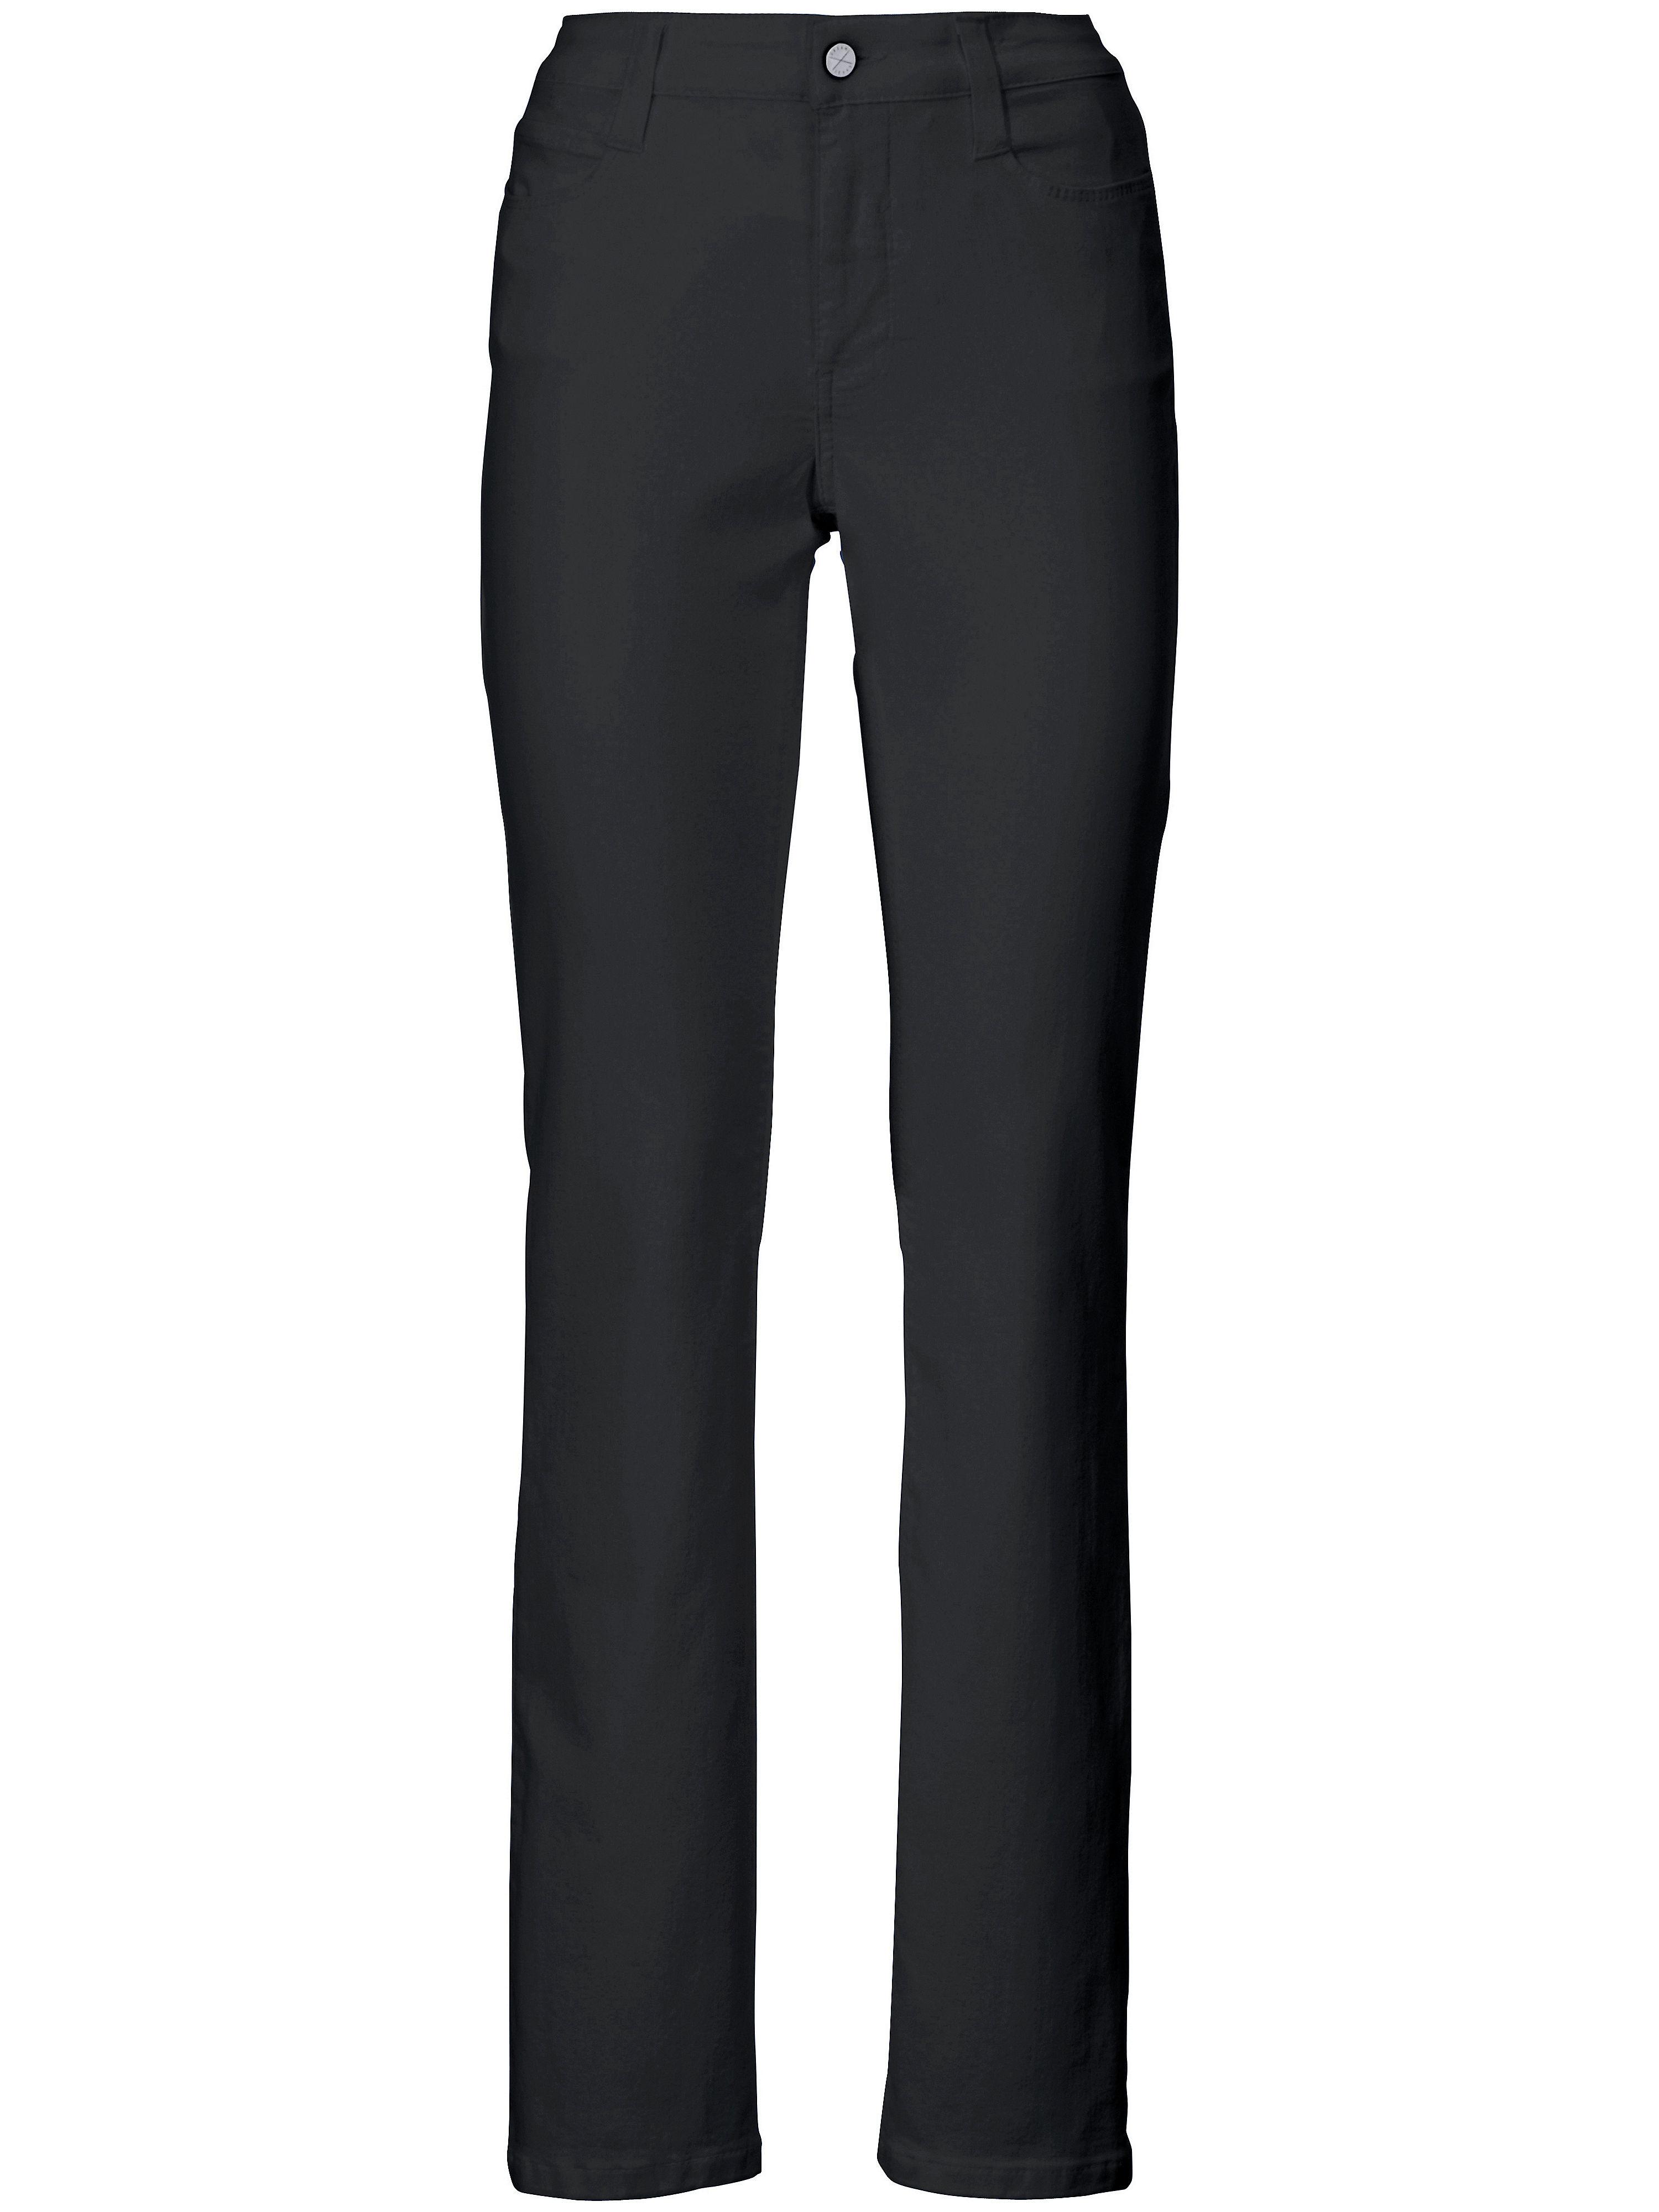 code promo met jeans bons et codes de r ductions met jeans. Black Bedroom Furniture Sets. Home Design Ideas